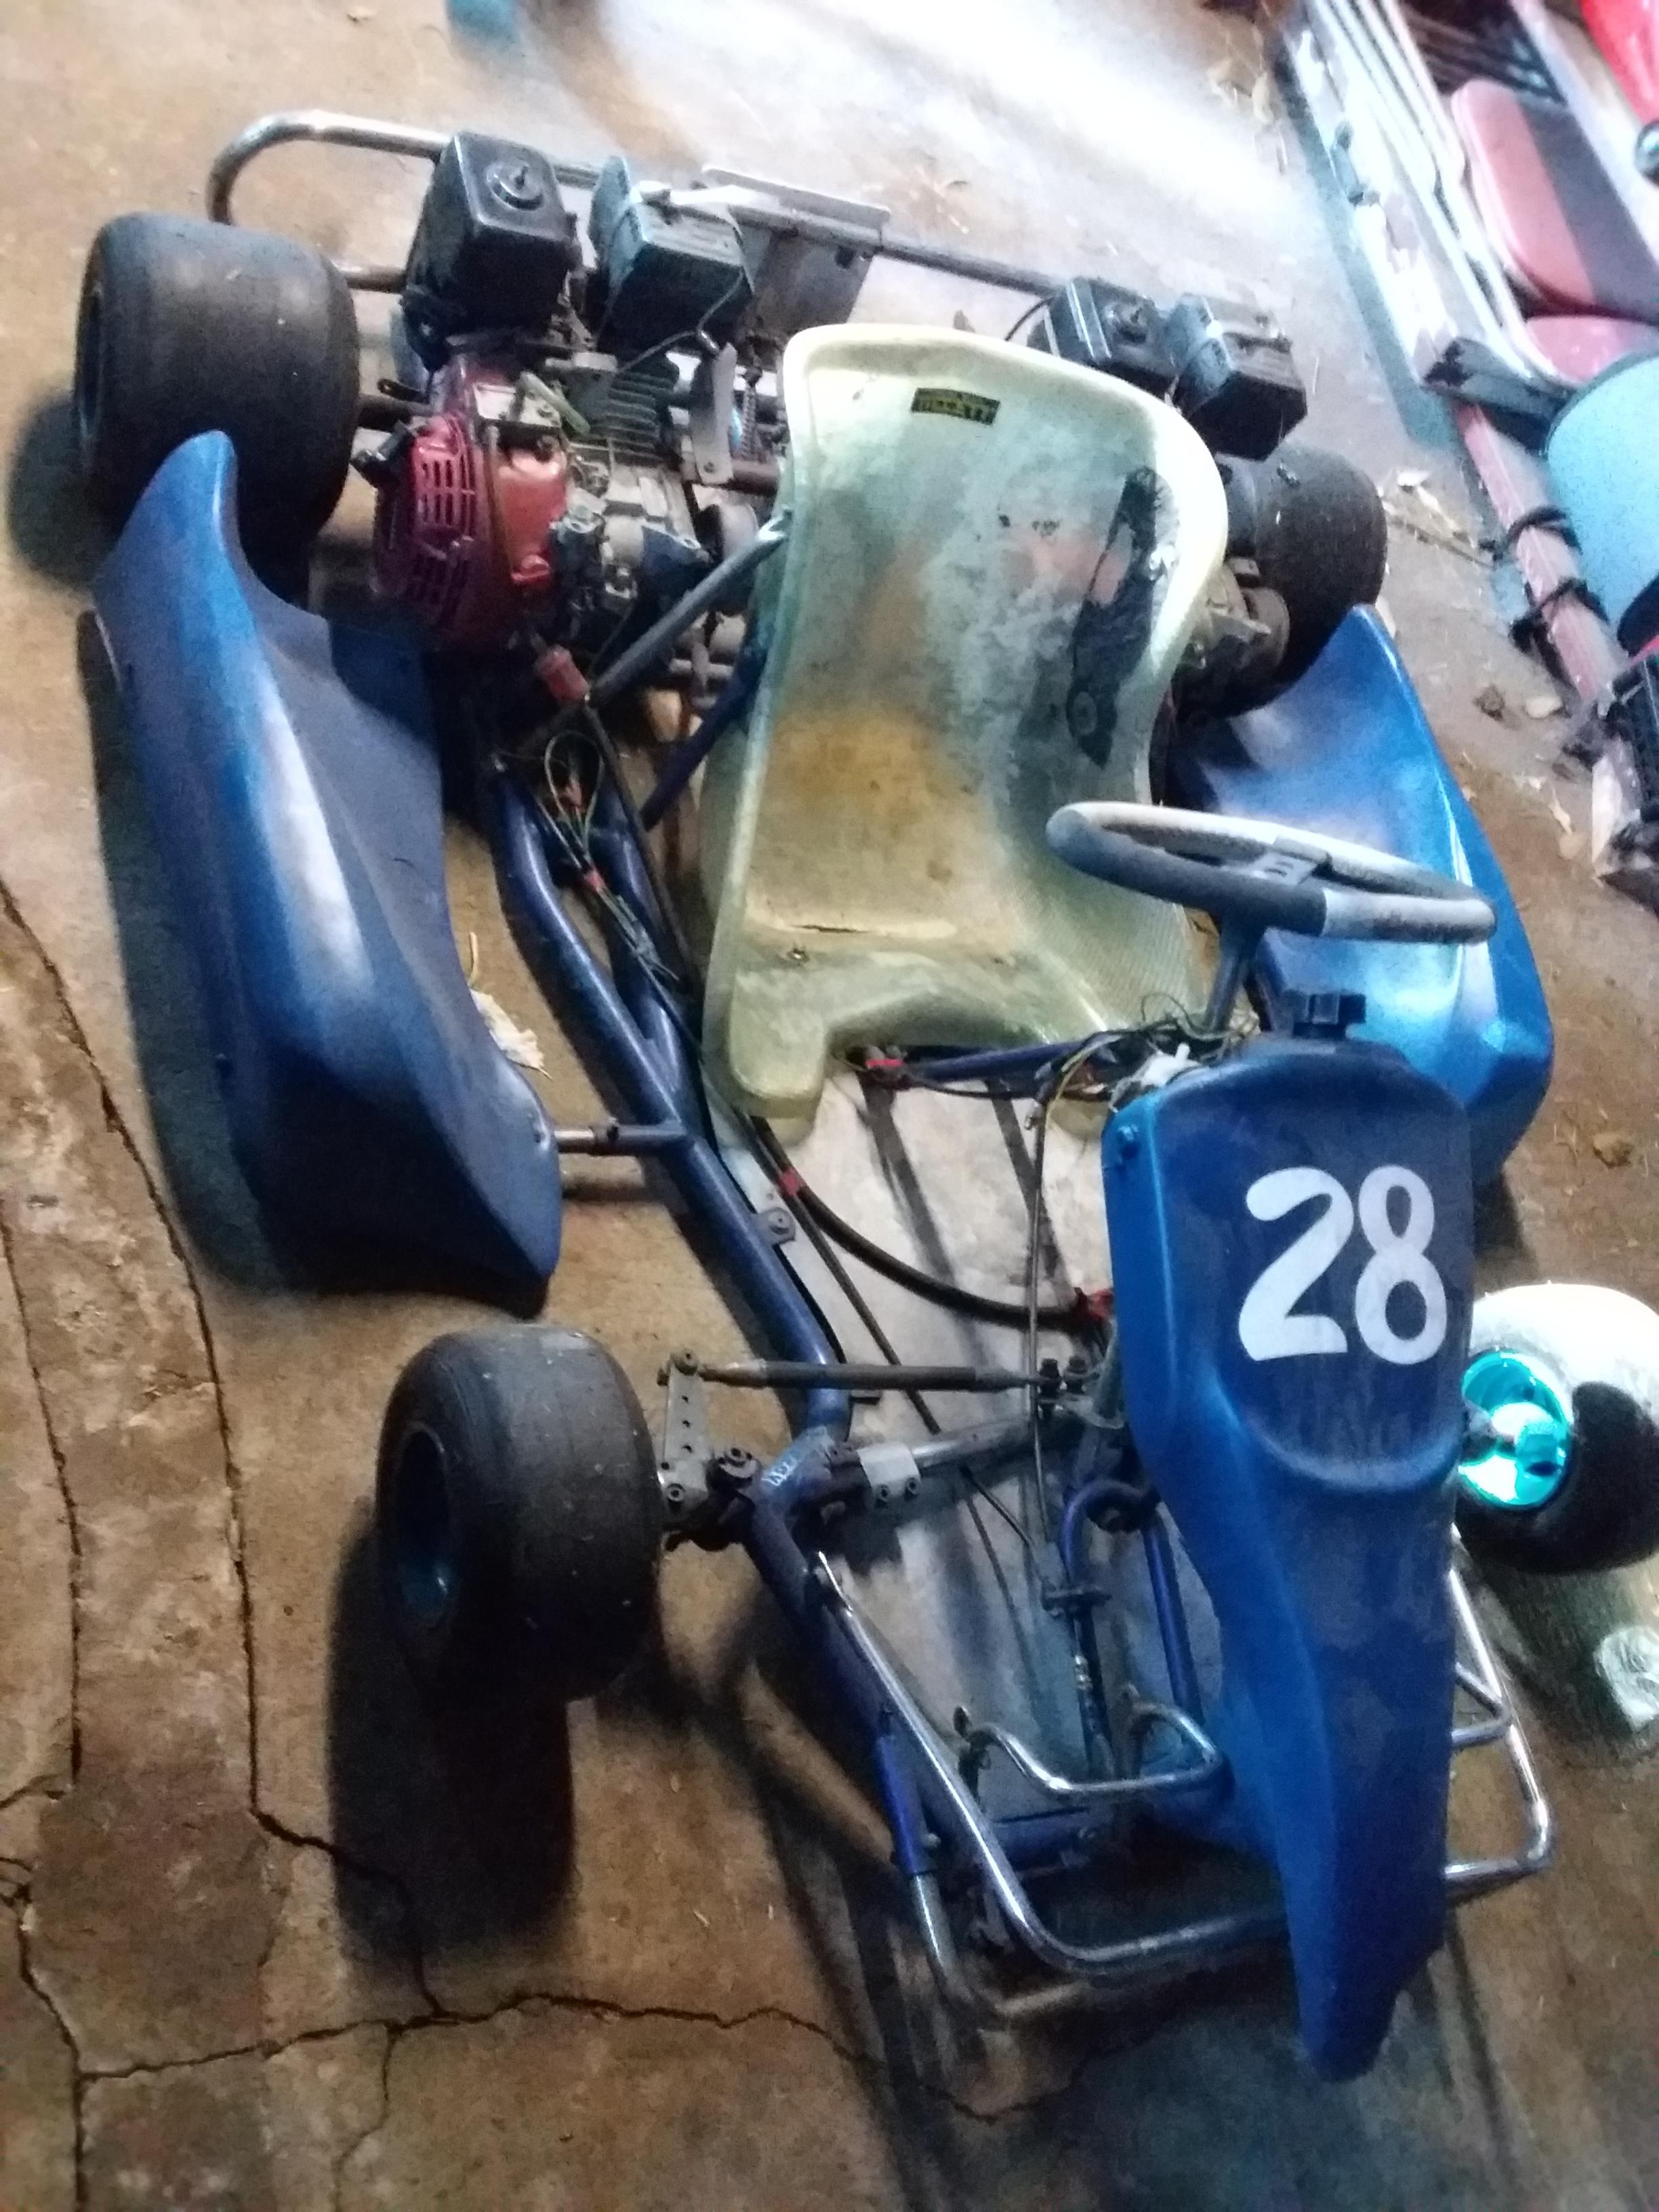 Energy dual engine kart - KartPulse Forums: Karting's